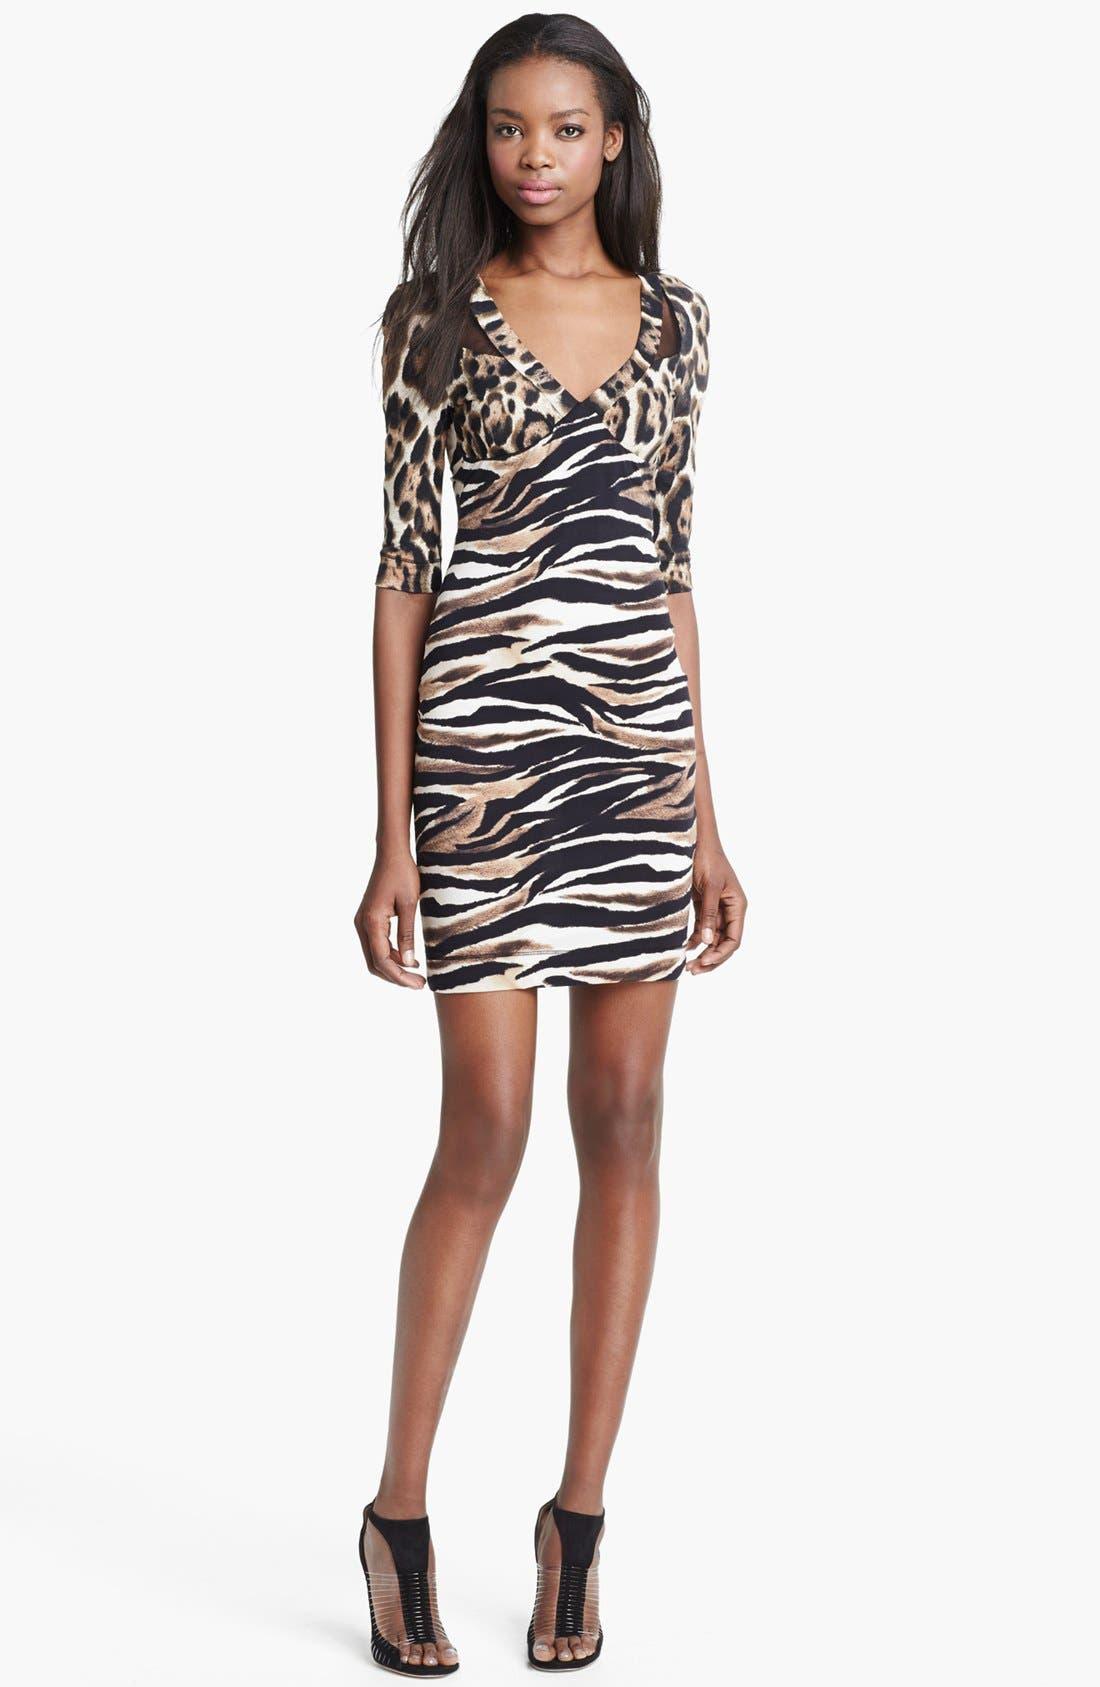 Main Image - Just Cavalli Leopard & Zebra Print Jersey Dress